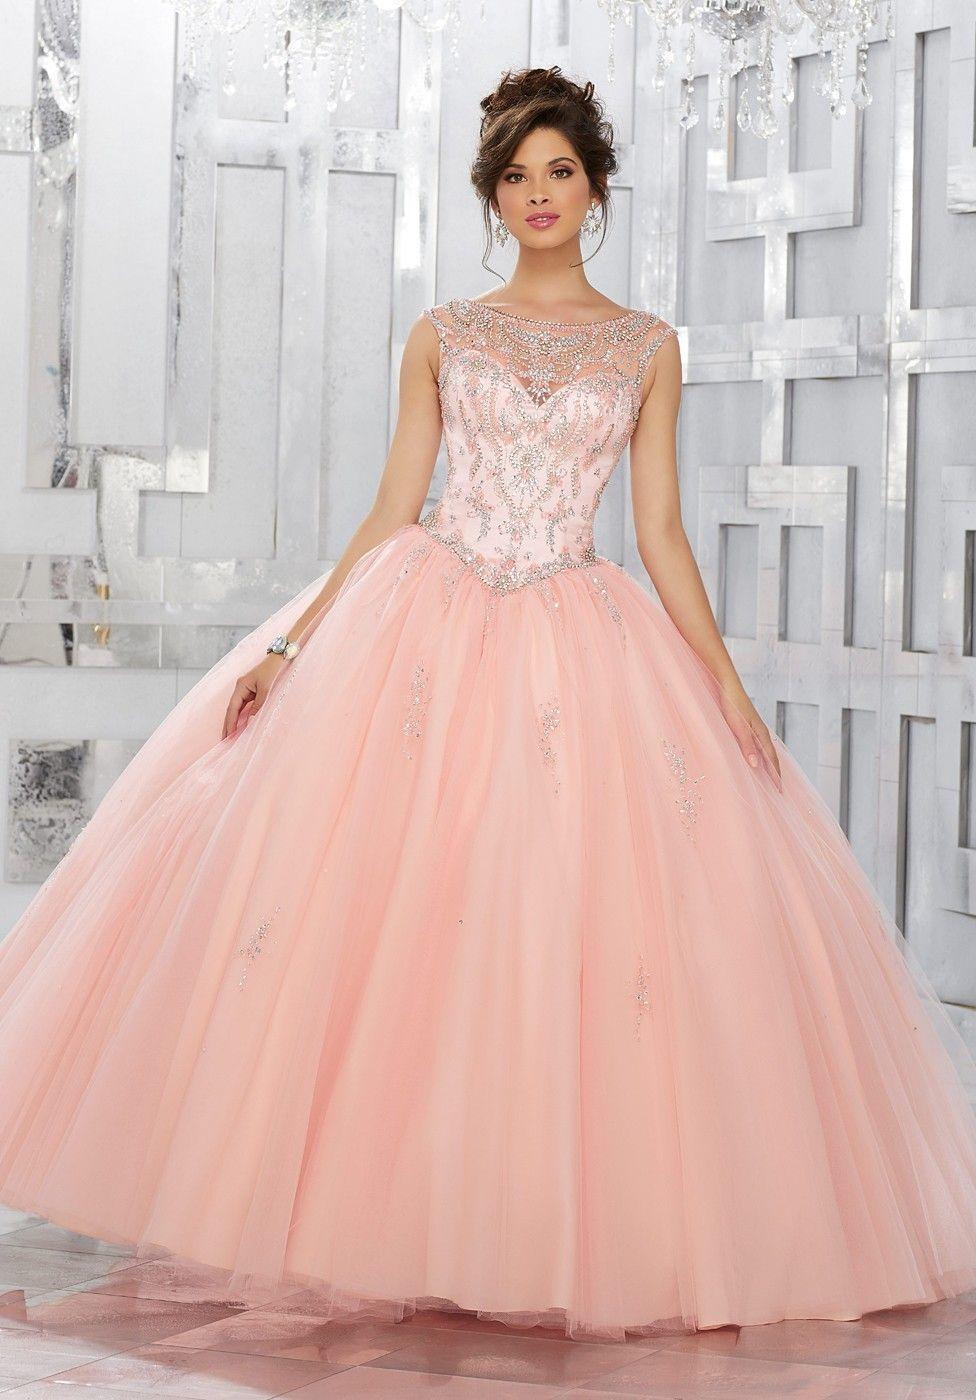 fa01fb56914 Image result for quinceanera dresses peach